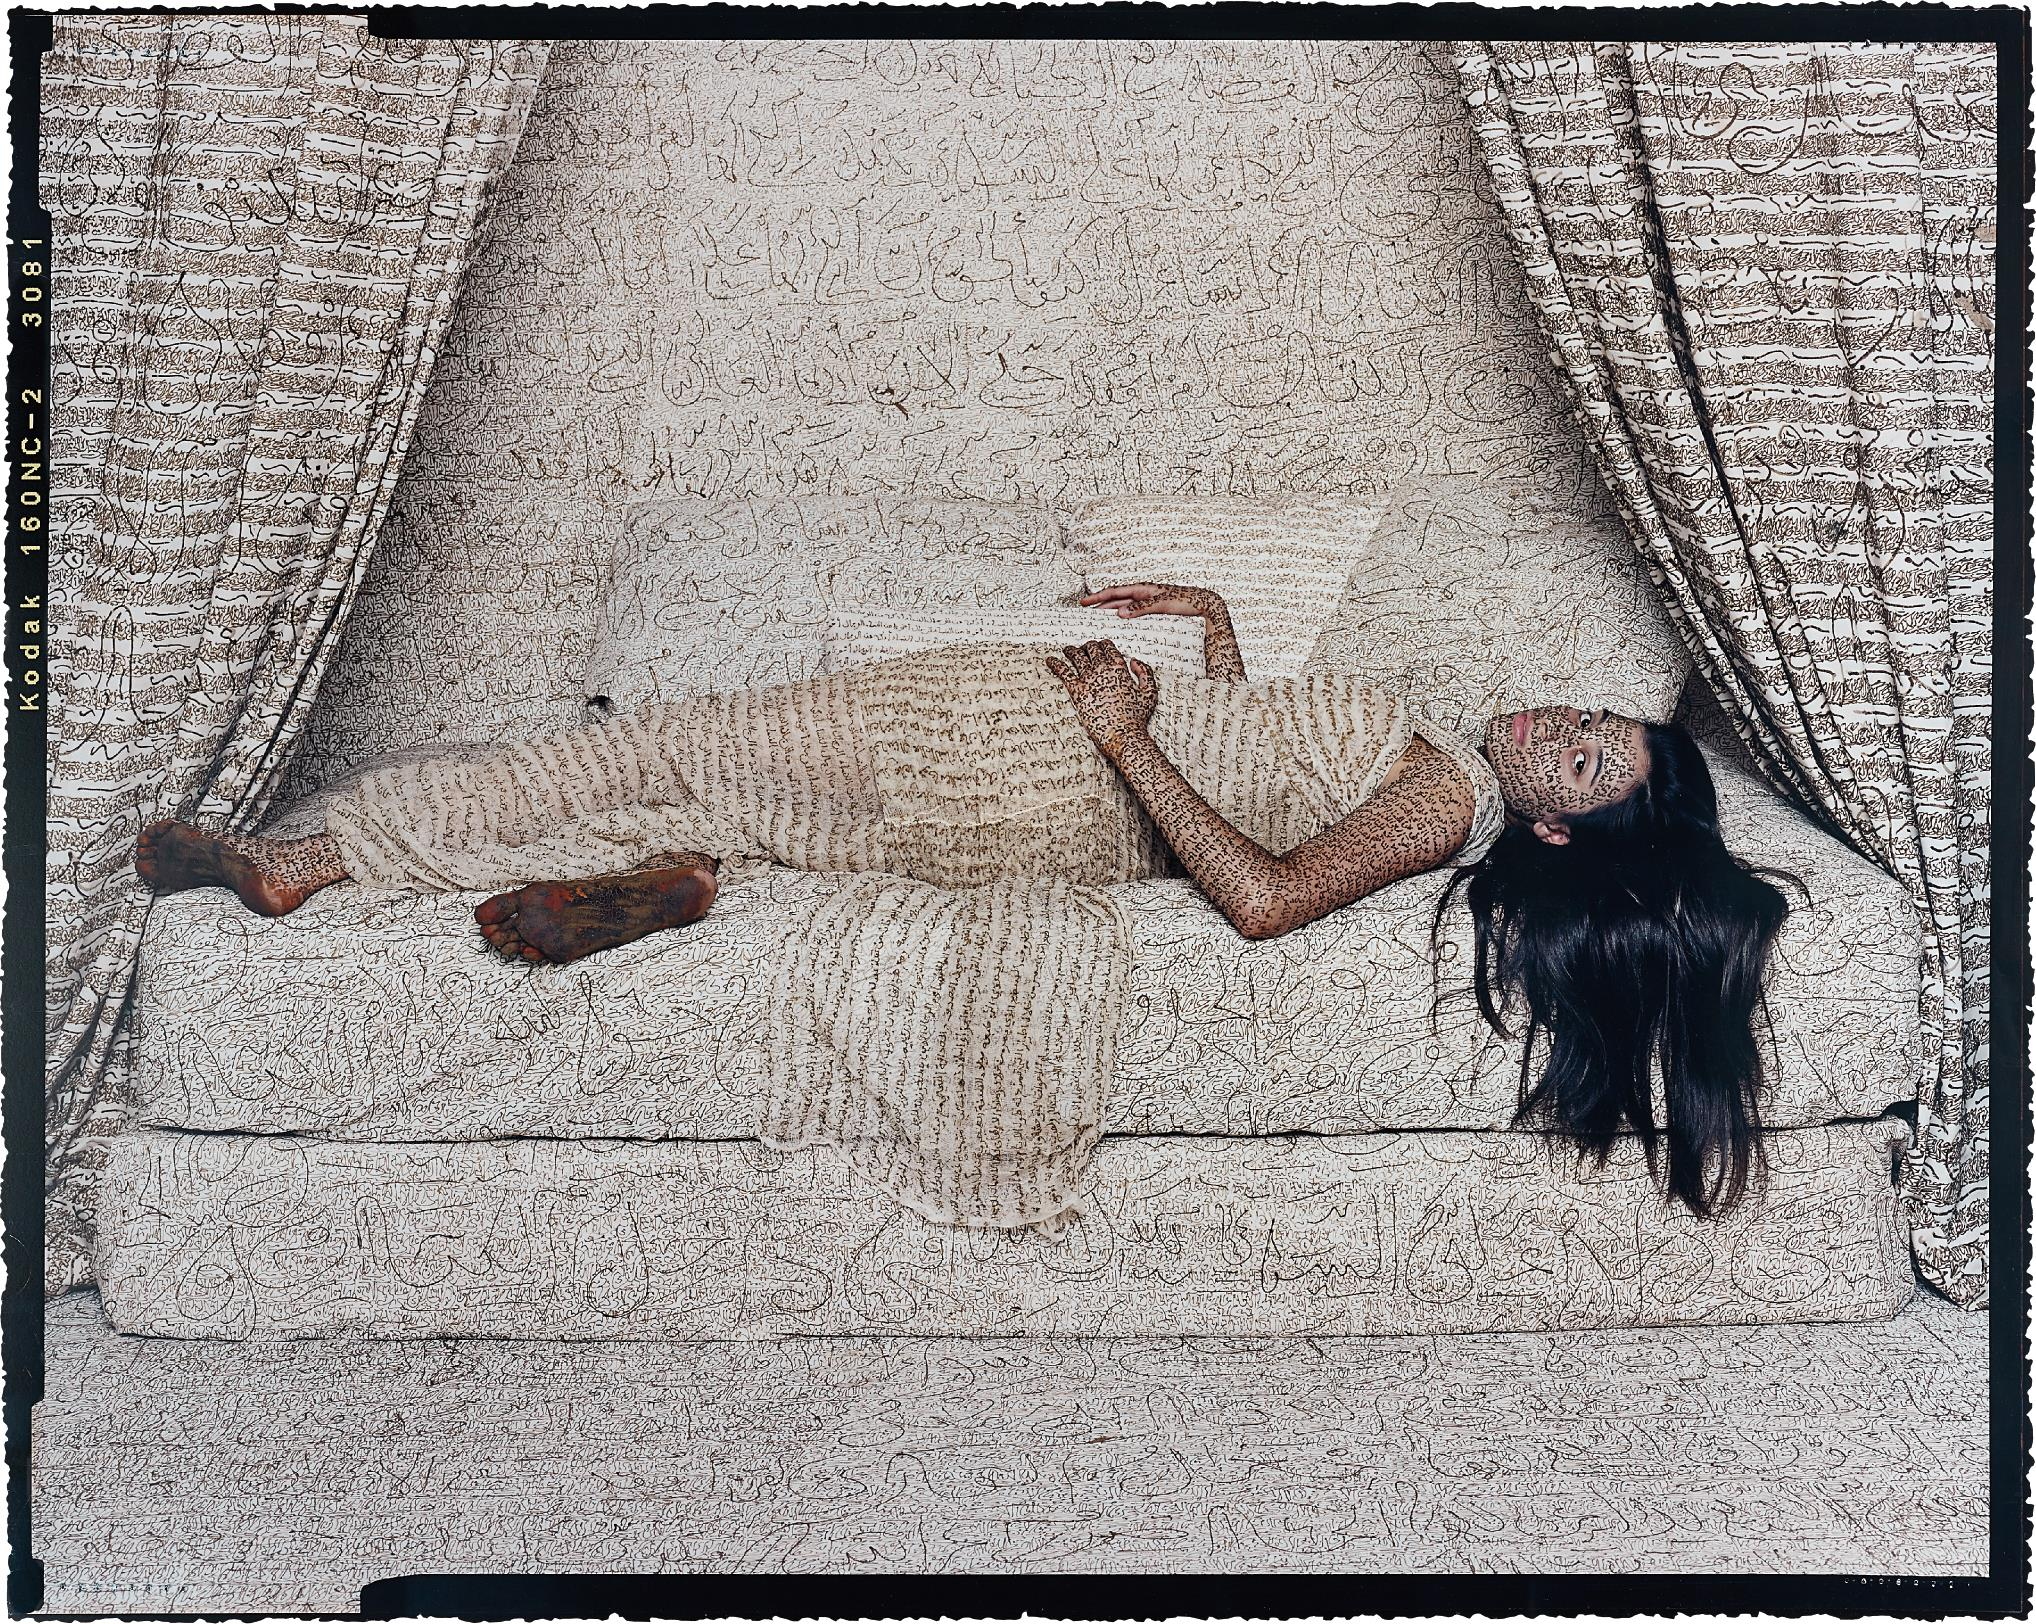 Lalla Essaydi-Les Femmes Du Maroc: Harem Beauty #2-2008